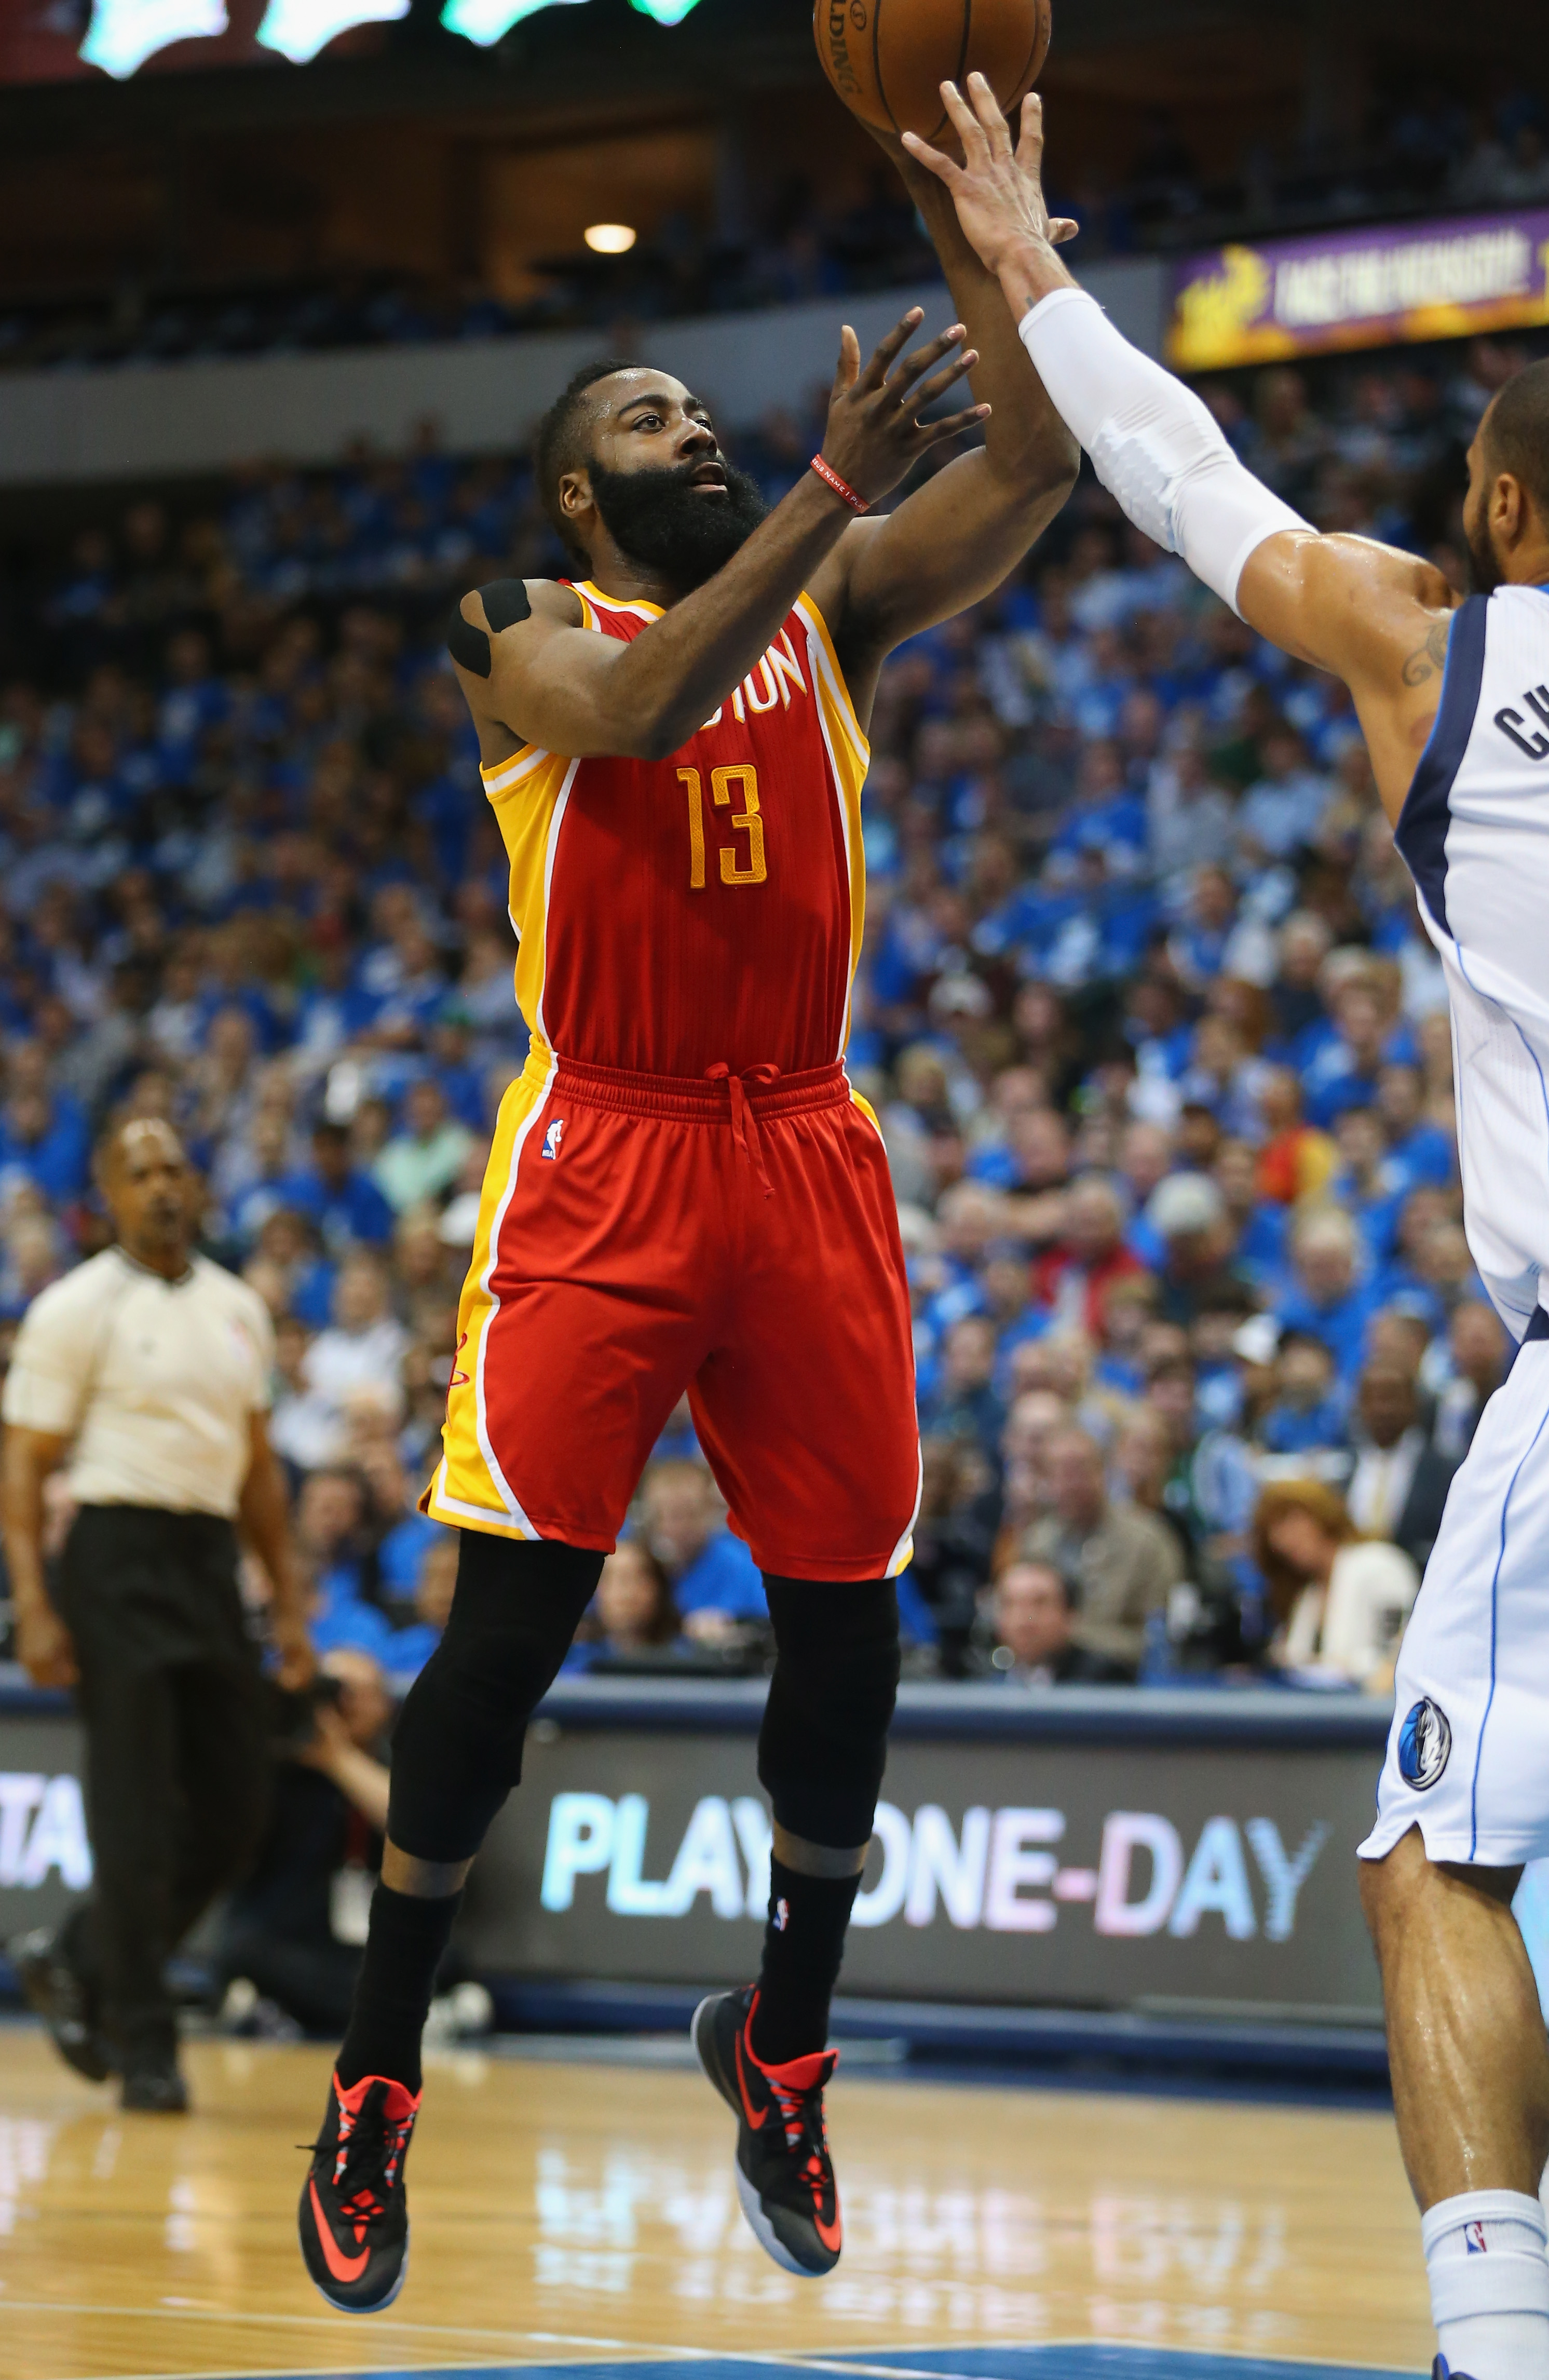 Rockets vs. Mavericks 2015 final score: 3 things we learned as the Rockets took a 3-0 series lead